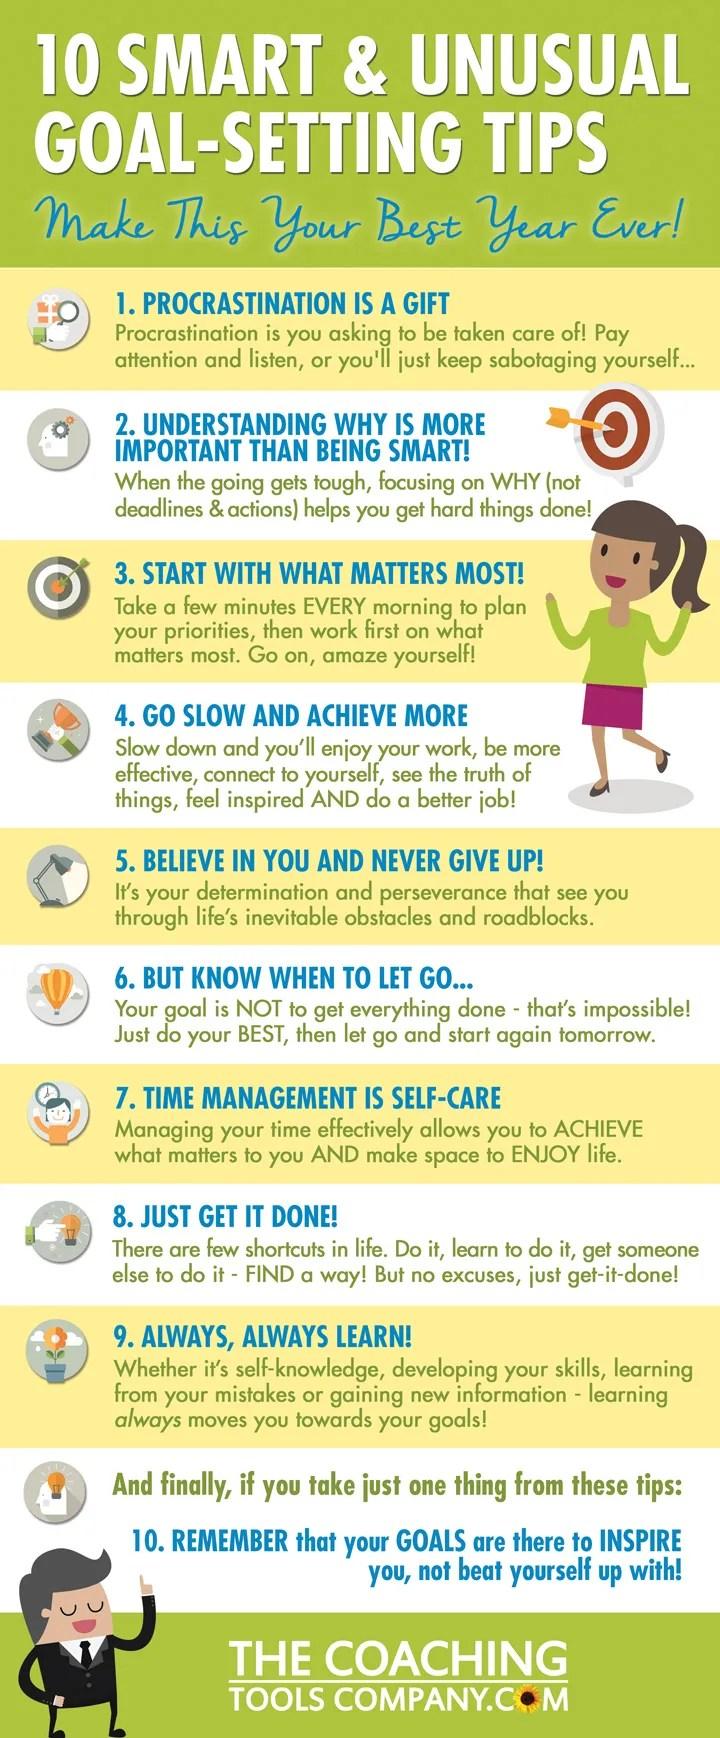 10 Smart Unusual Goal Setting Tips Infographic